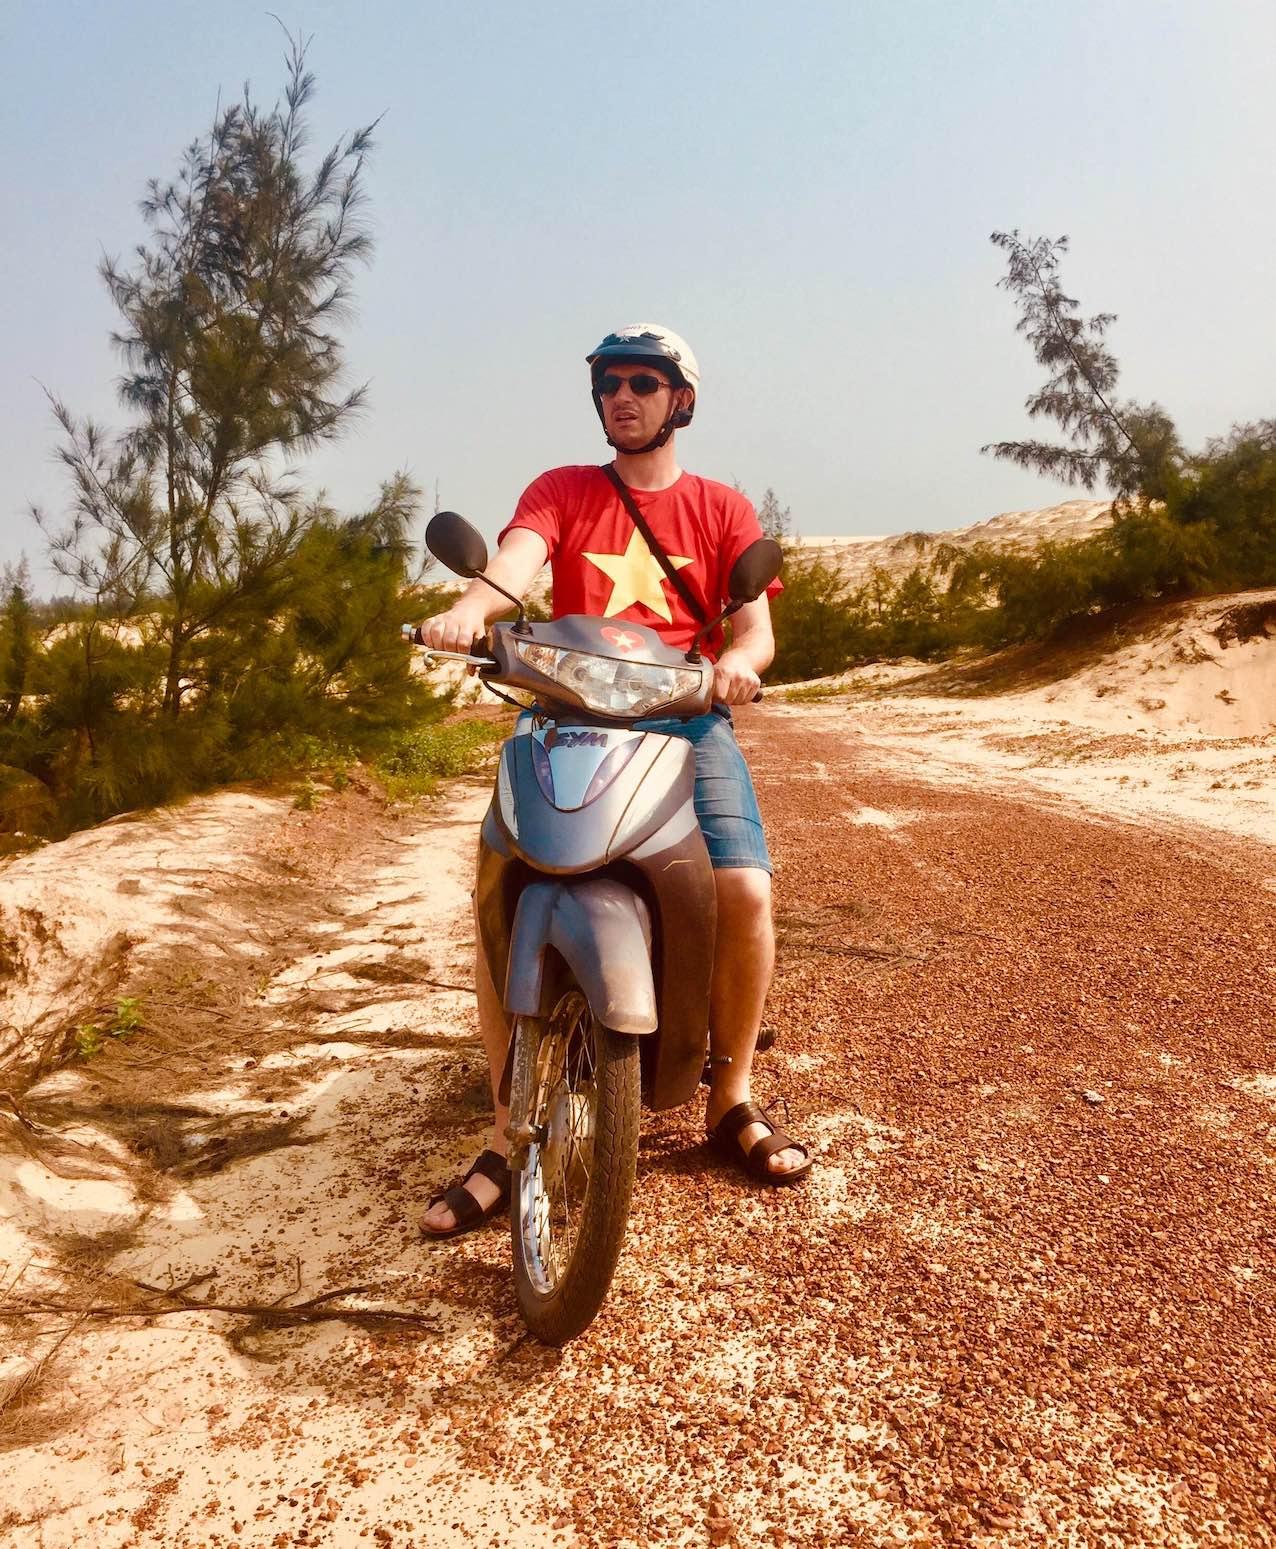 Motorcycling Dong Hoi Vietnam.